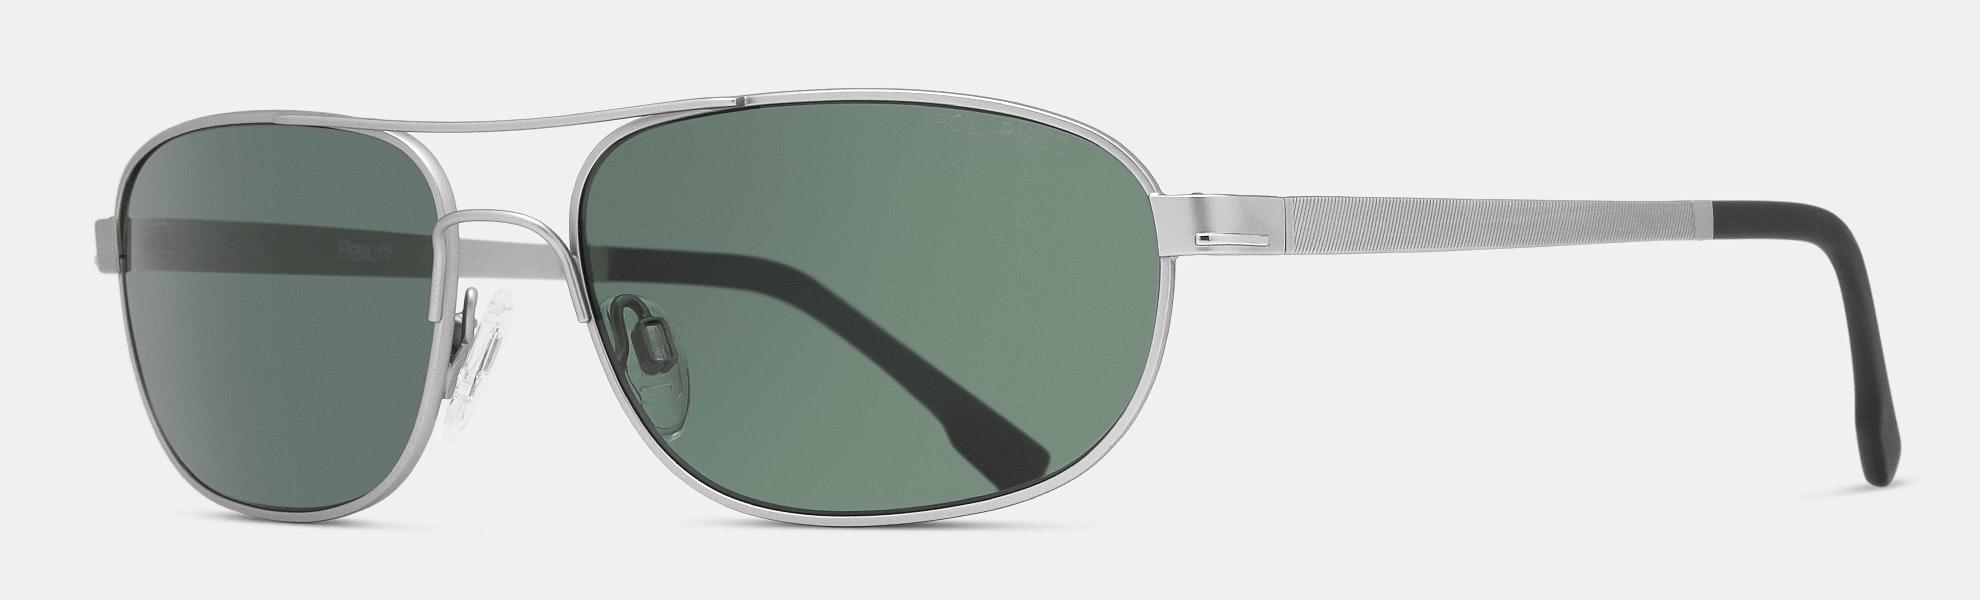 Flexon Sun FS-5027P Polarized Sunglasses